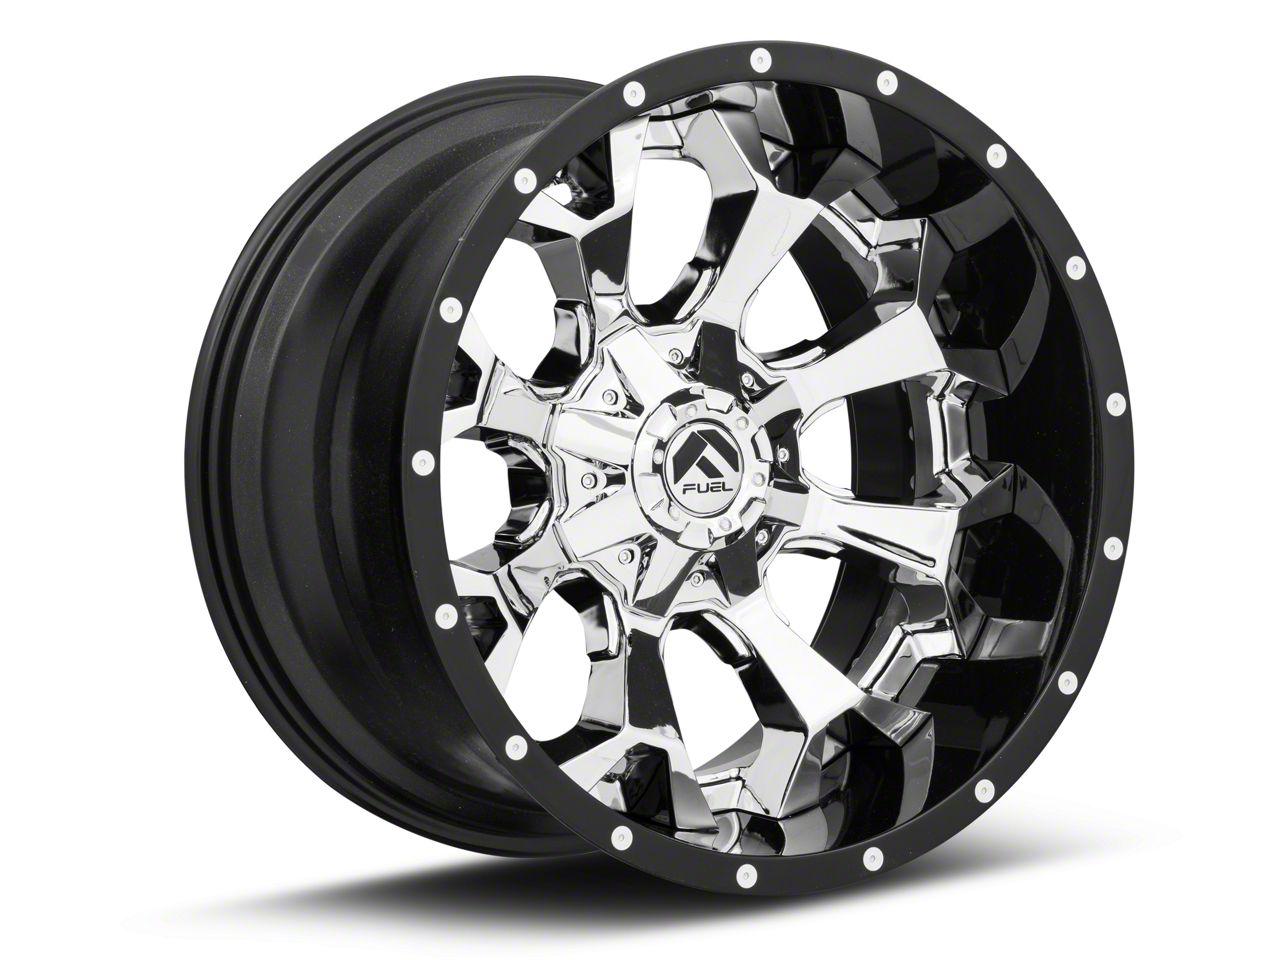 Fuel Wheels Assault Chrome 6-Lug Wheel - 20x12 (07-18 Sierra 1500)